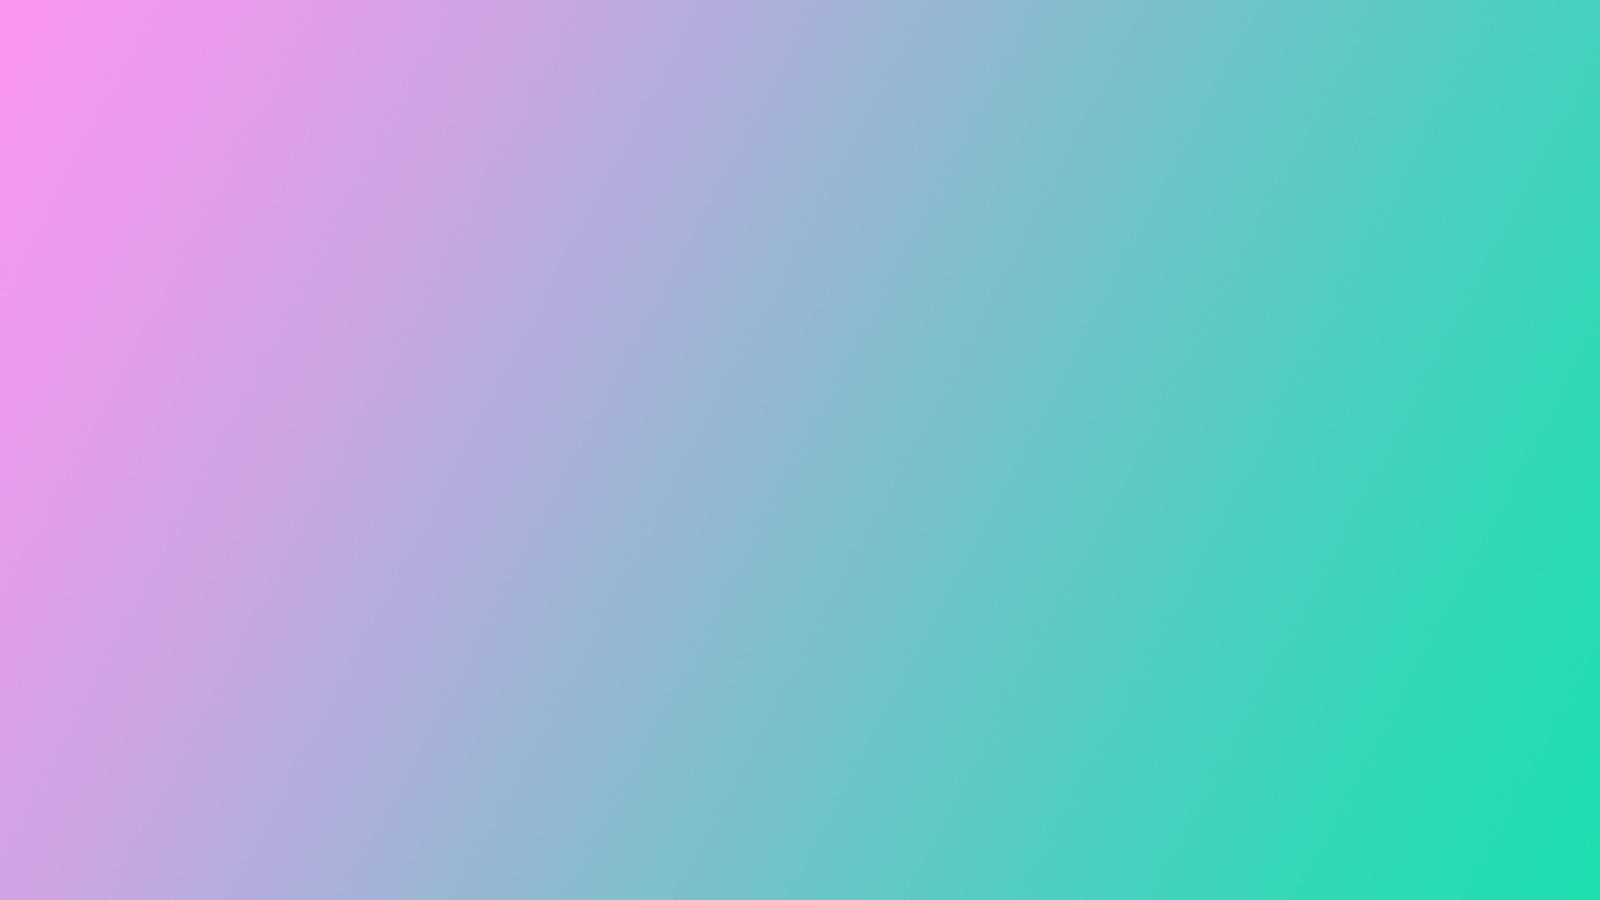 tumblr pastel backgrounds - photo #23